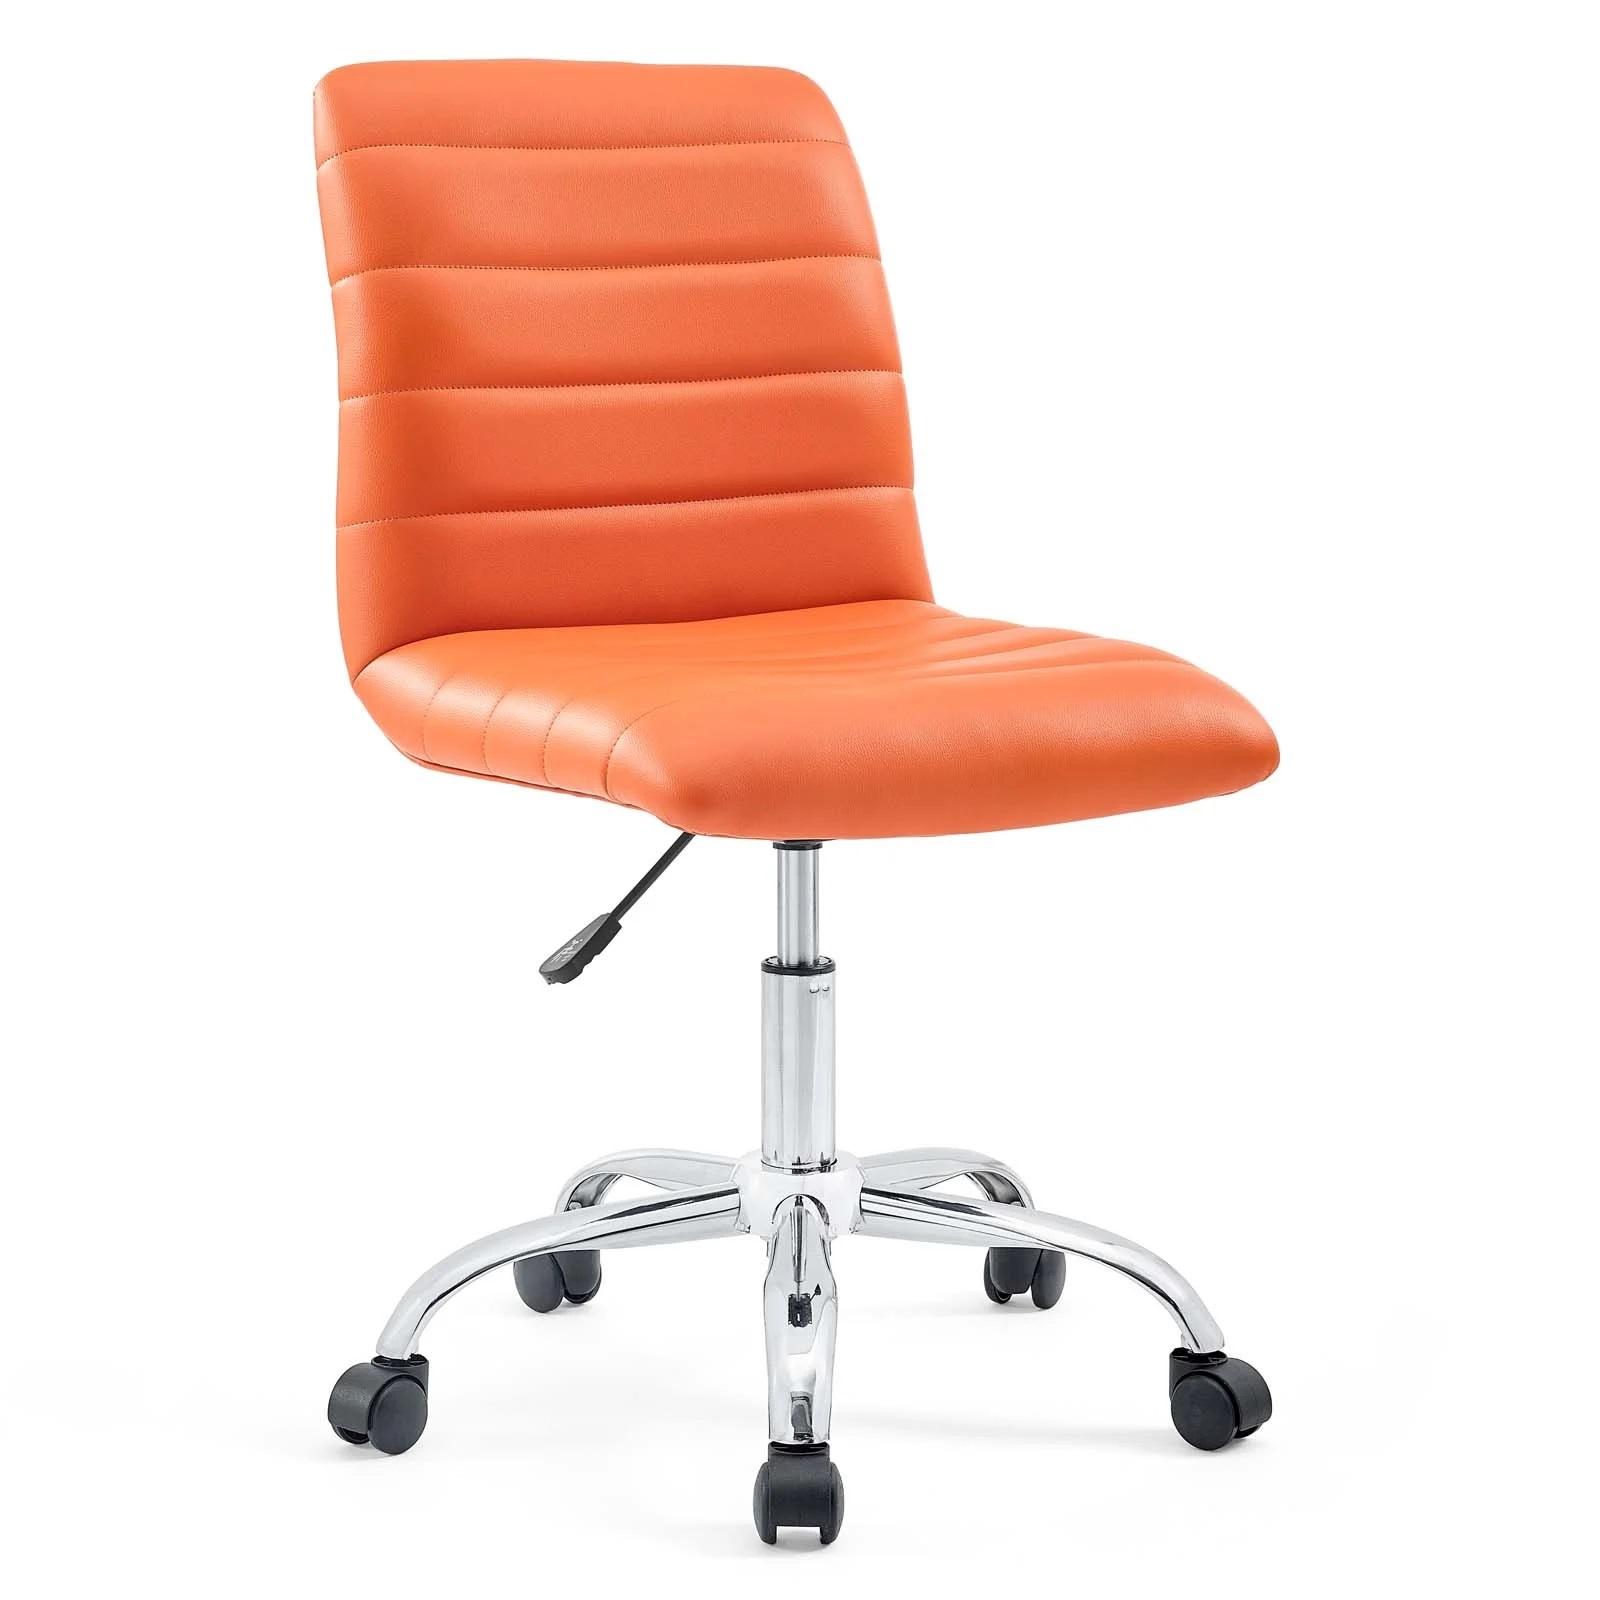 Armless Mid Back Vinyl Office Chair in Orange